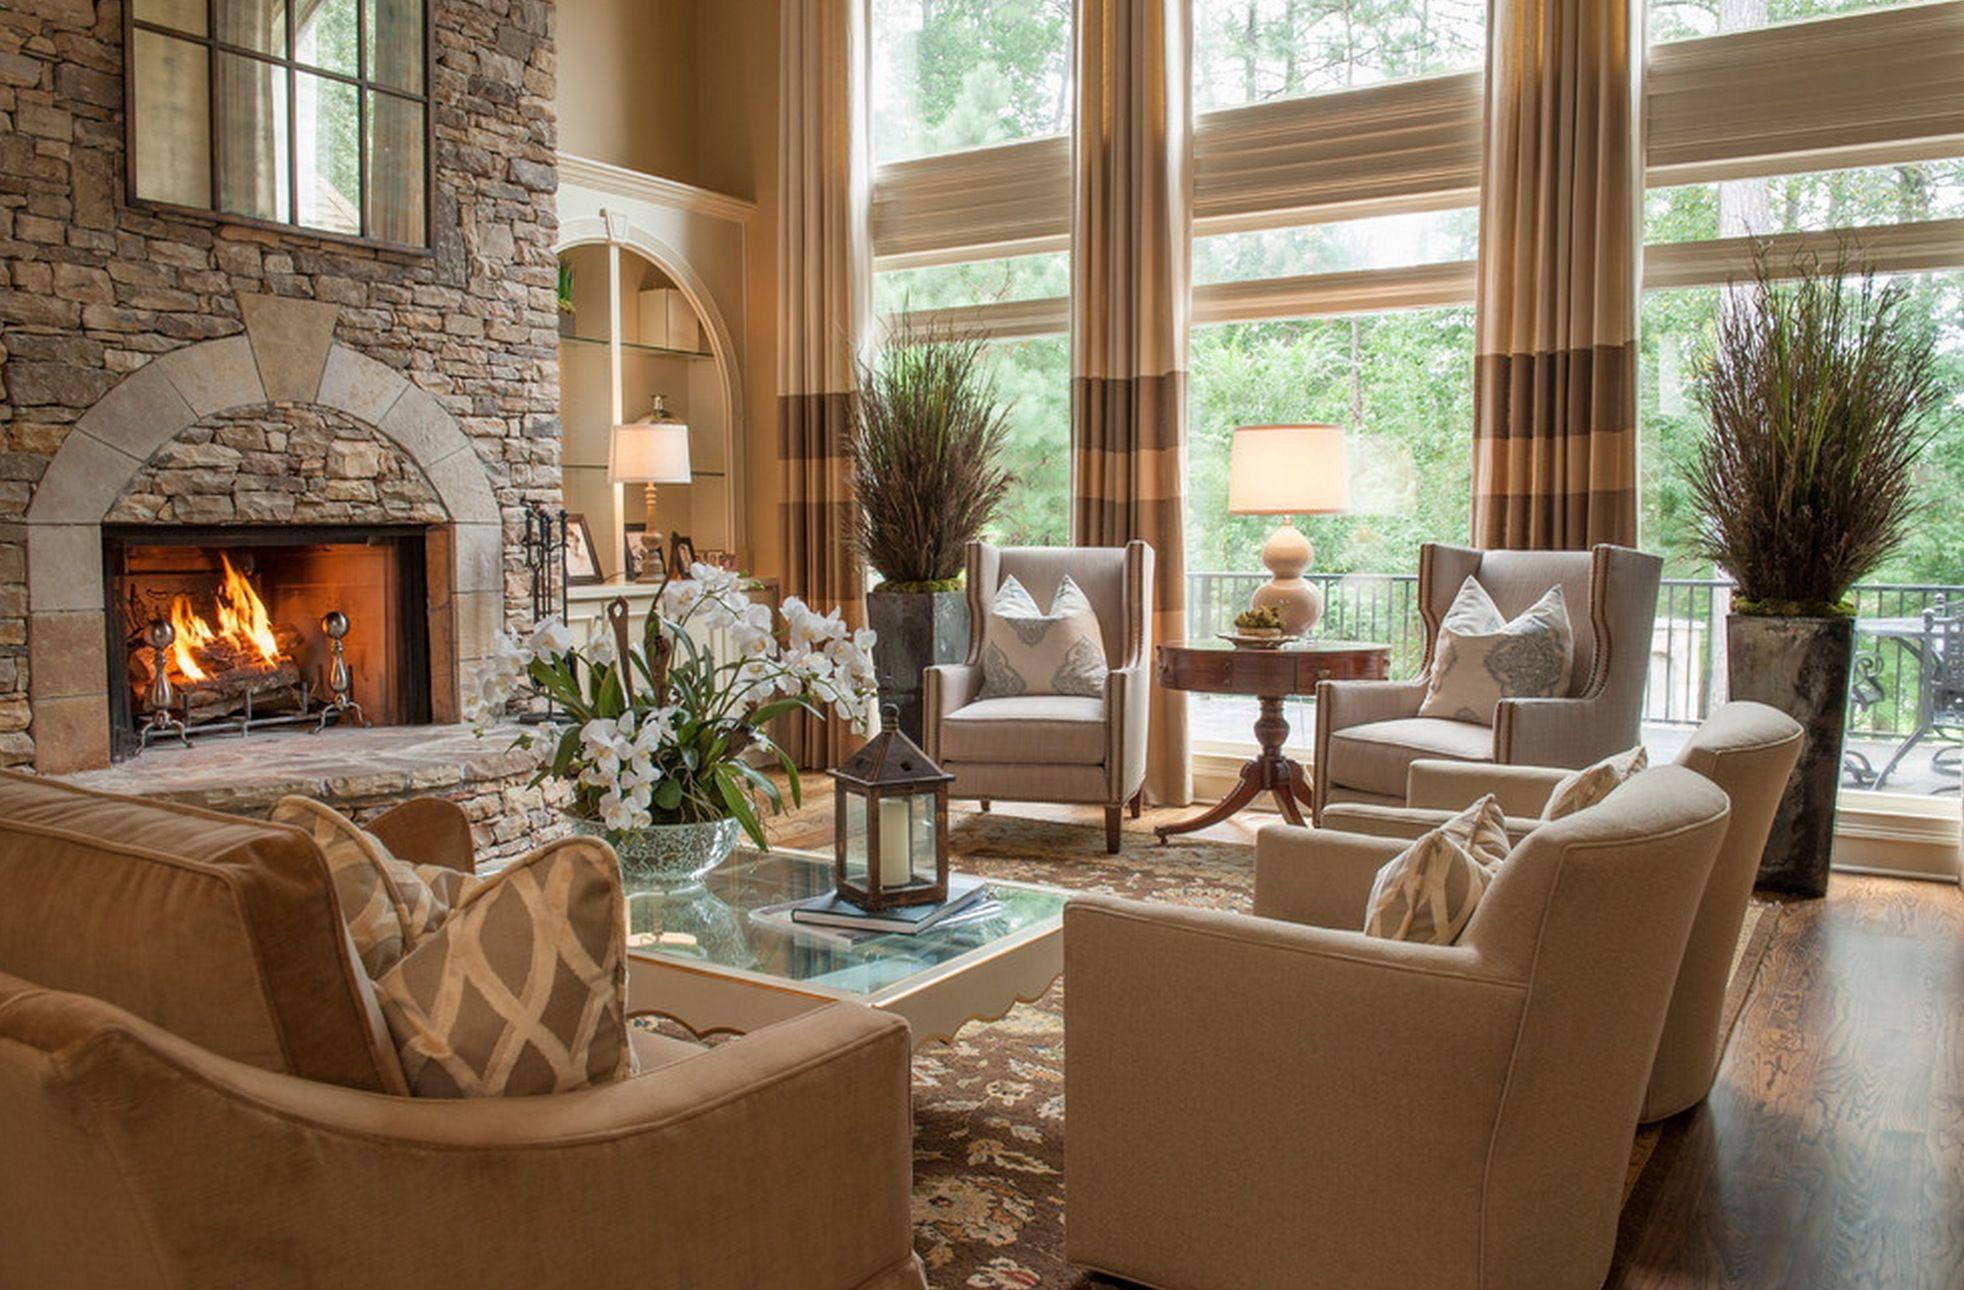 Esszimmer setzt traditionellen stil living room design august    home sweet home  pinterest